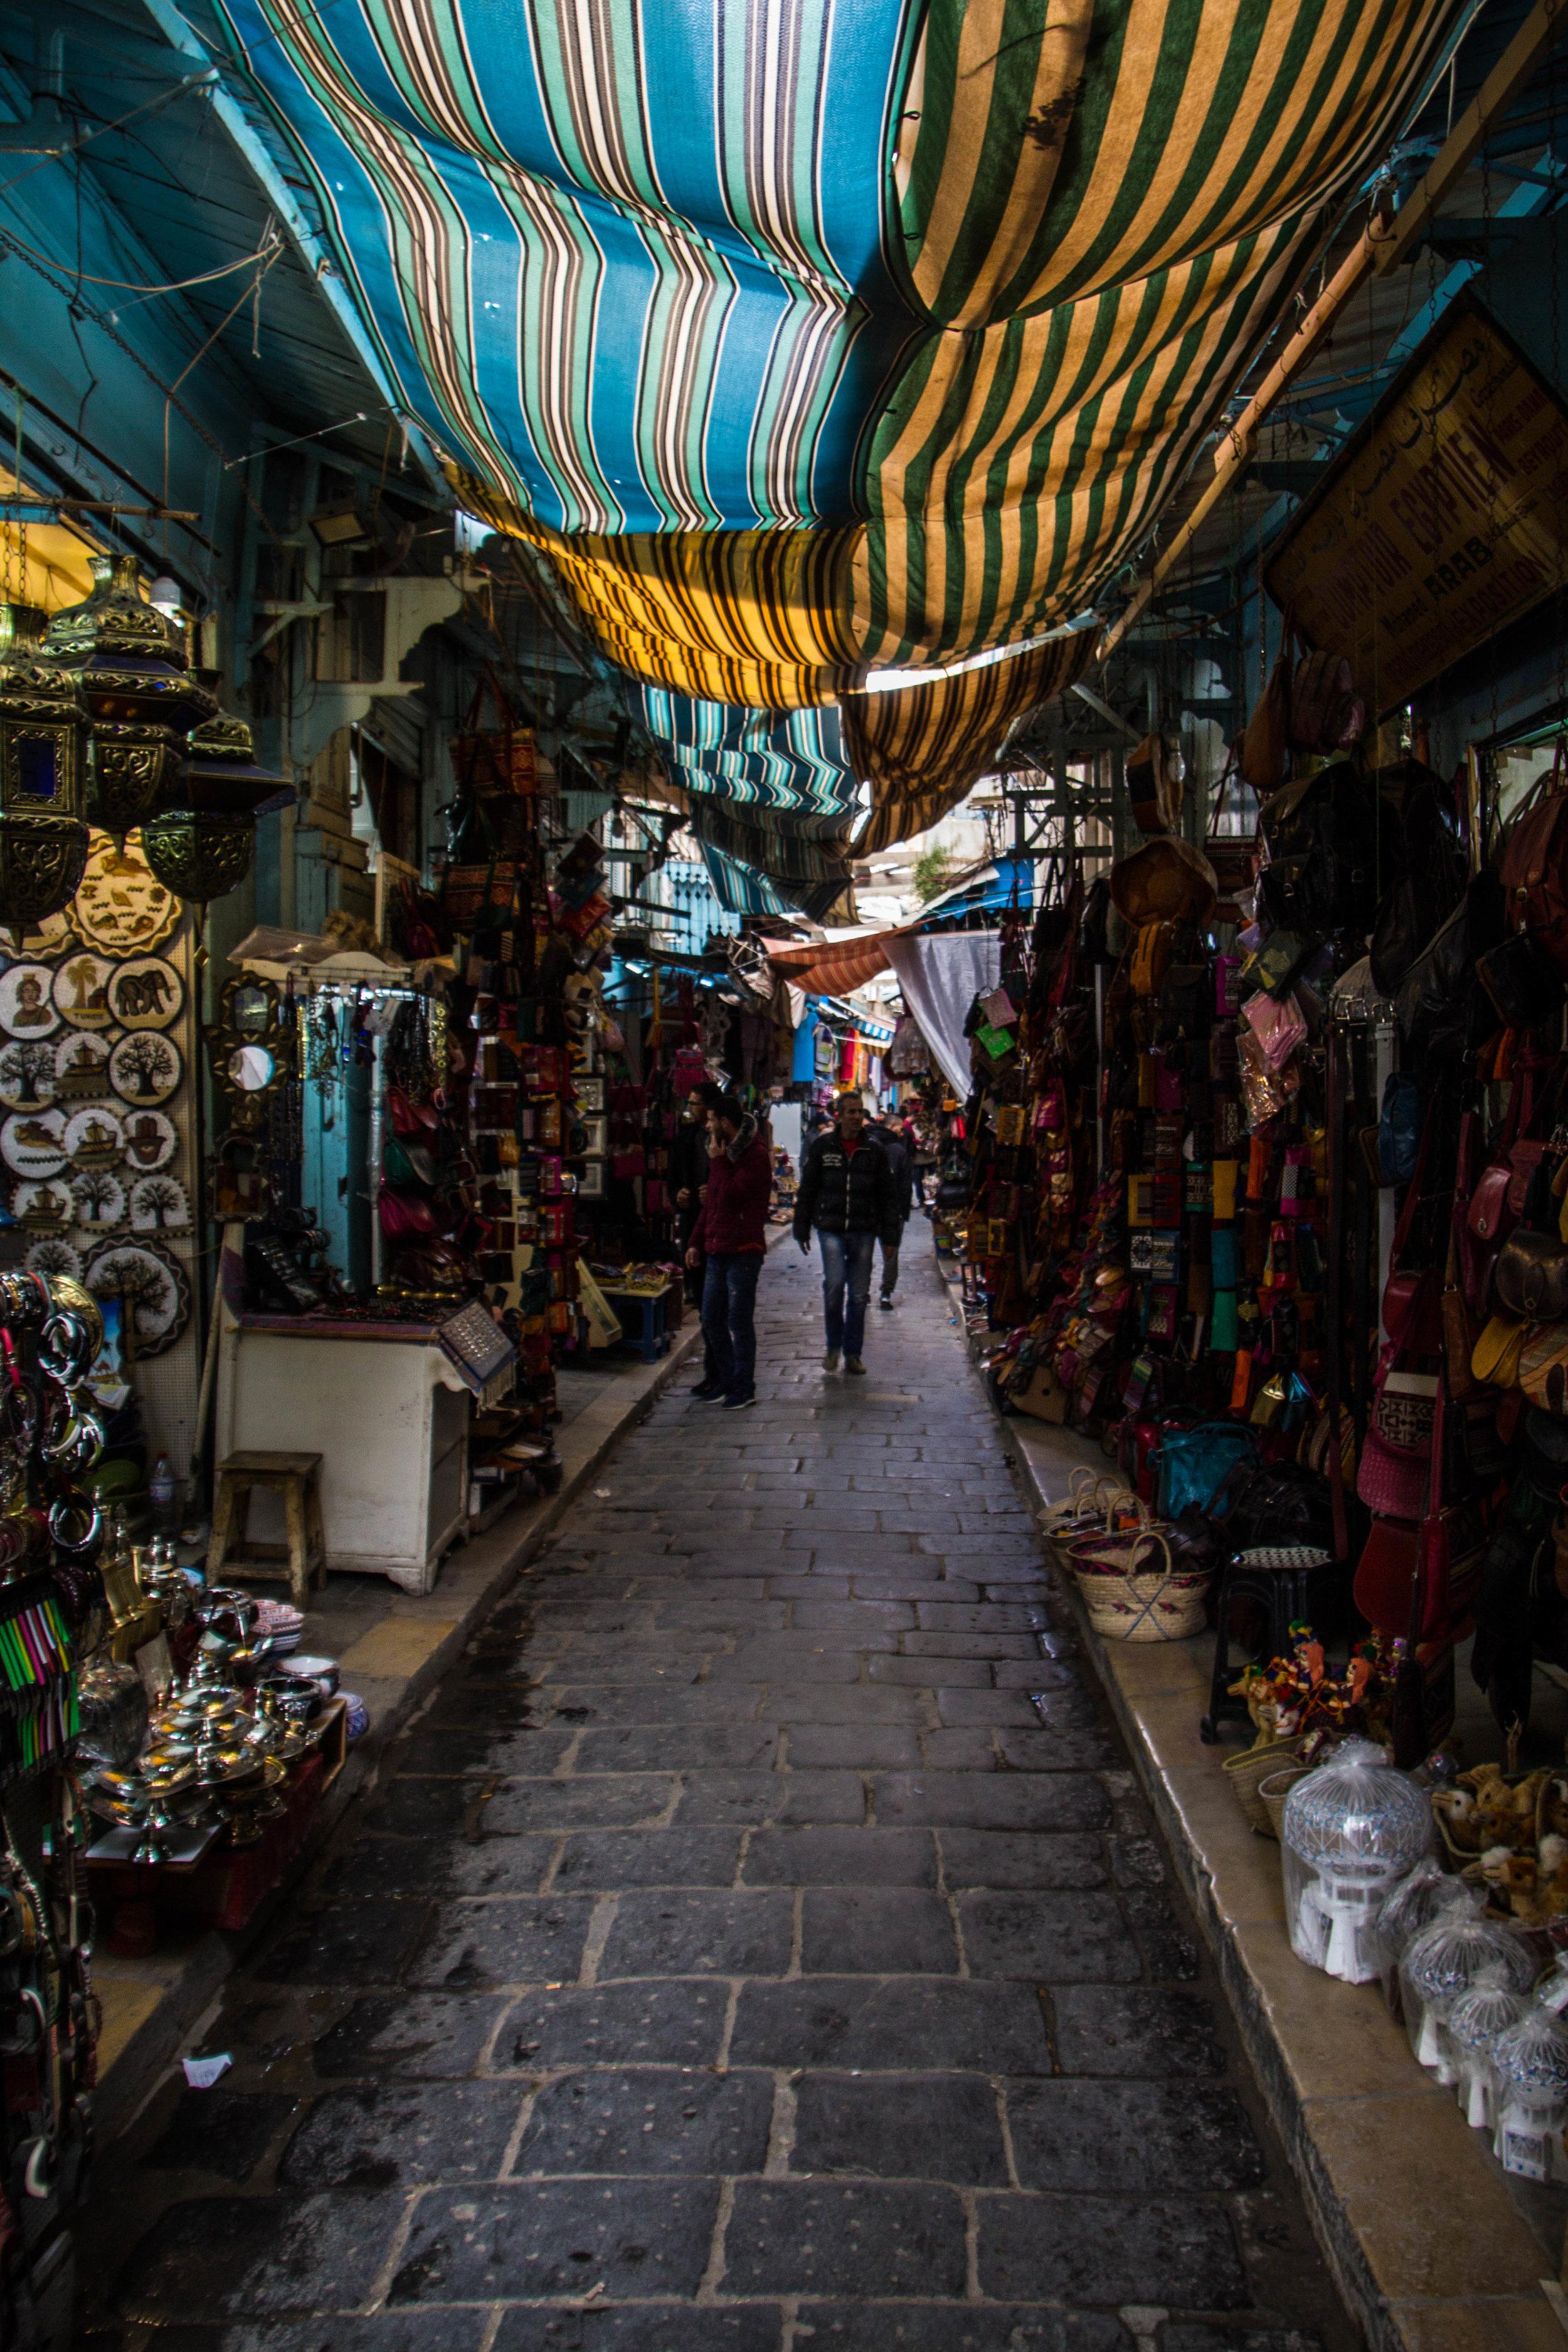 medina-photography-tunis-tunisia-4.jpg